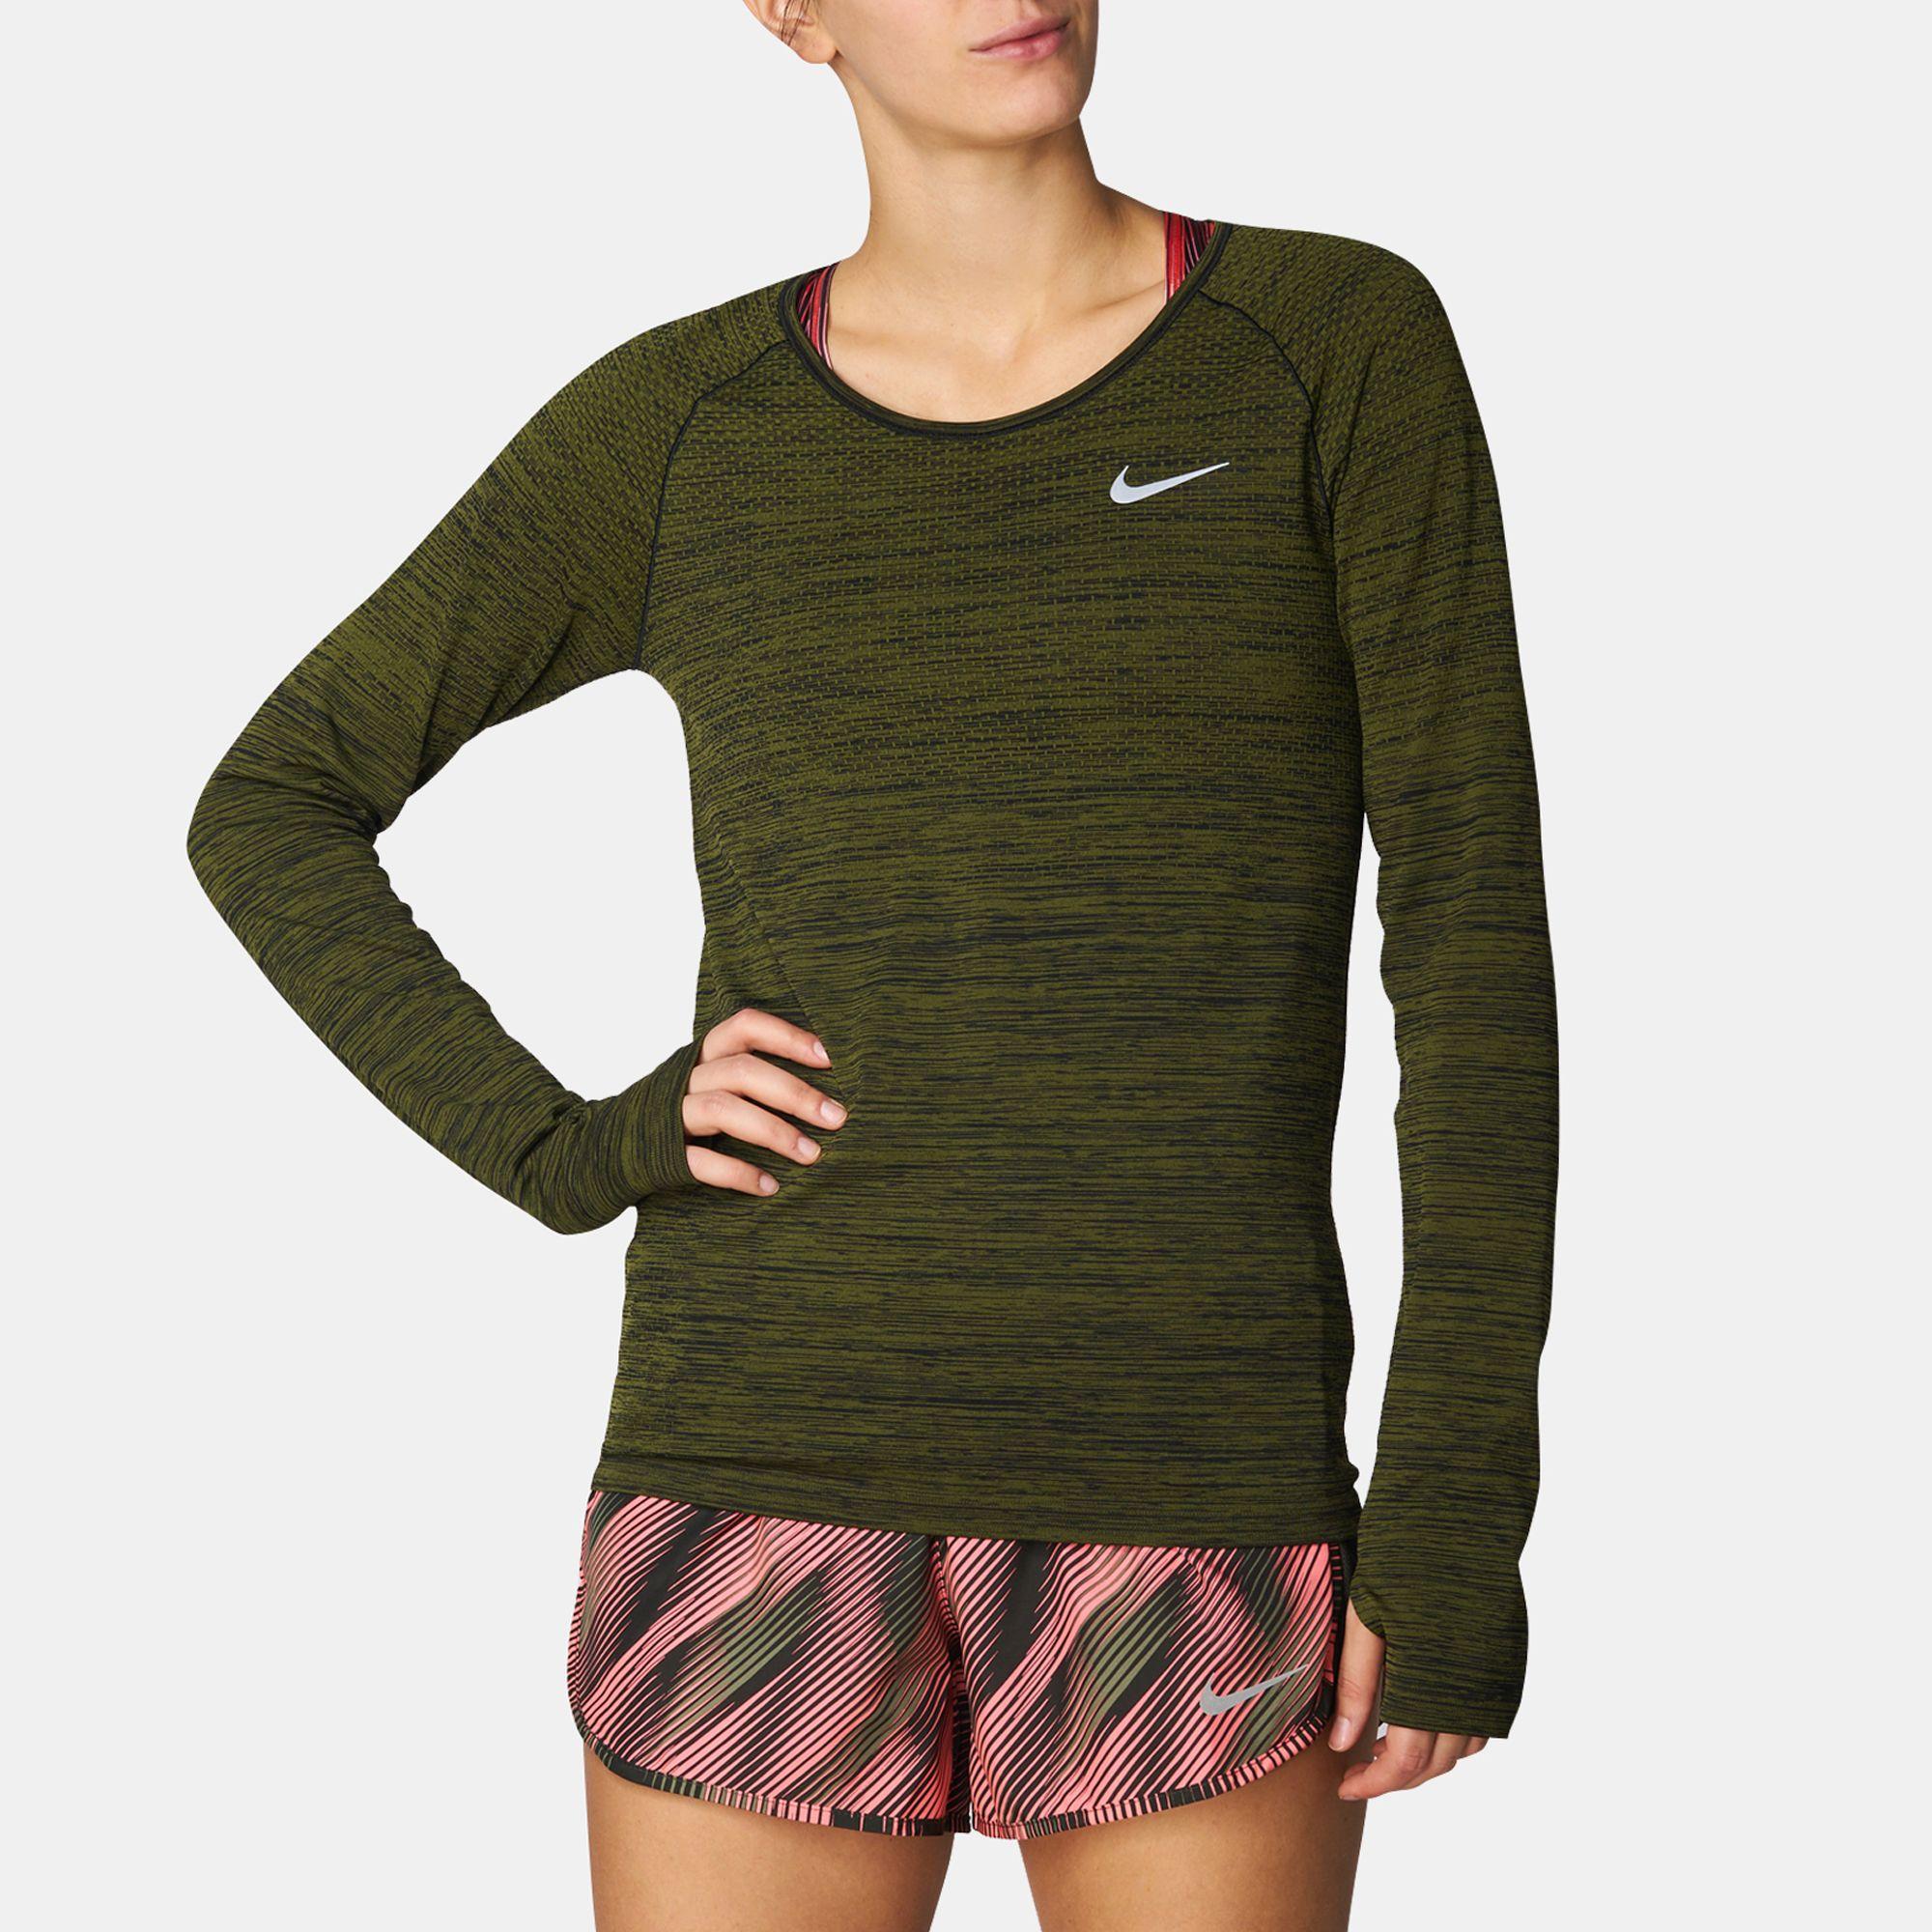 5cf702257f8b Shop Green Nike Dri-FIT Knit Long Sleeve Running T-Shirt for Womens by Nike